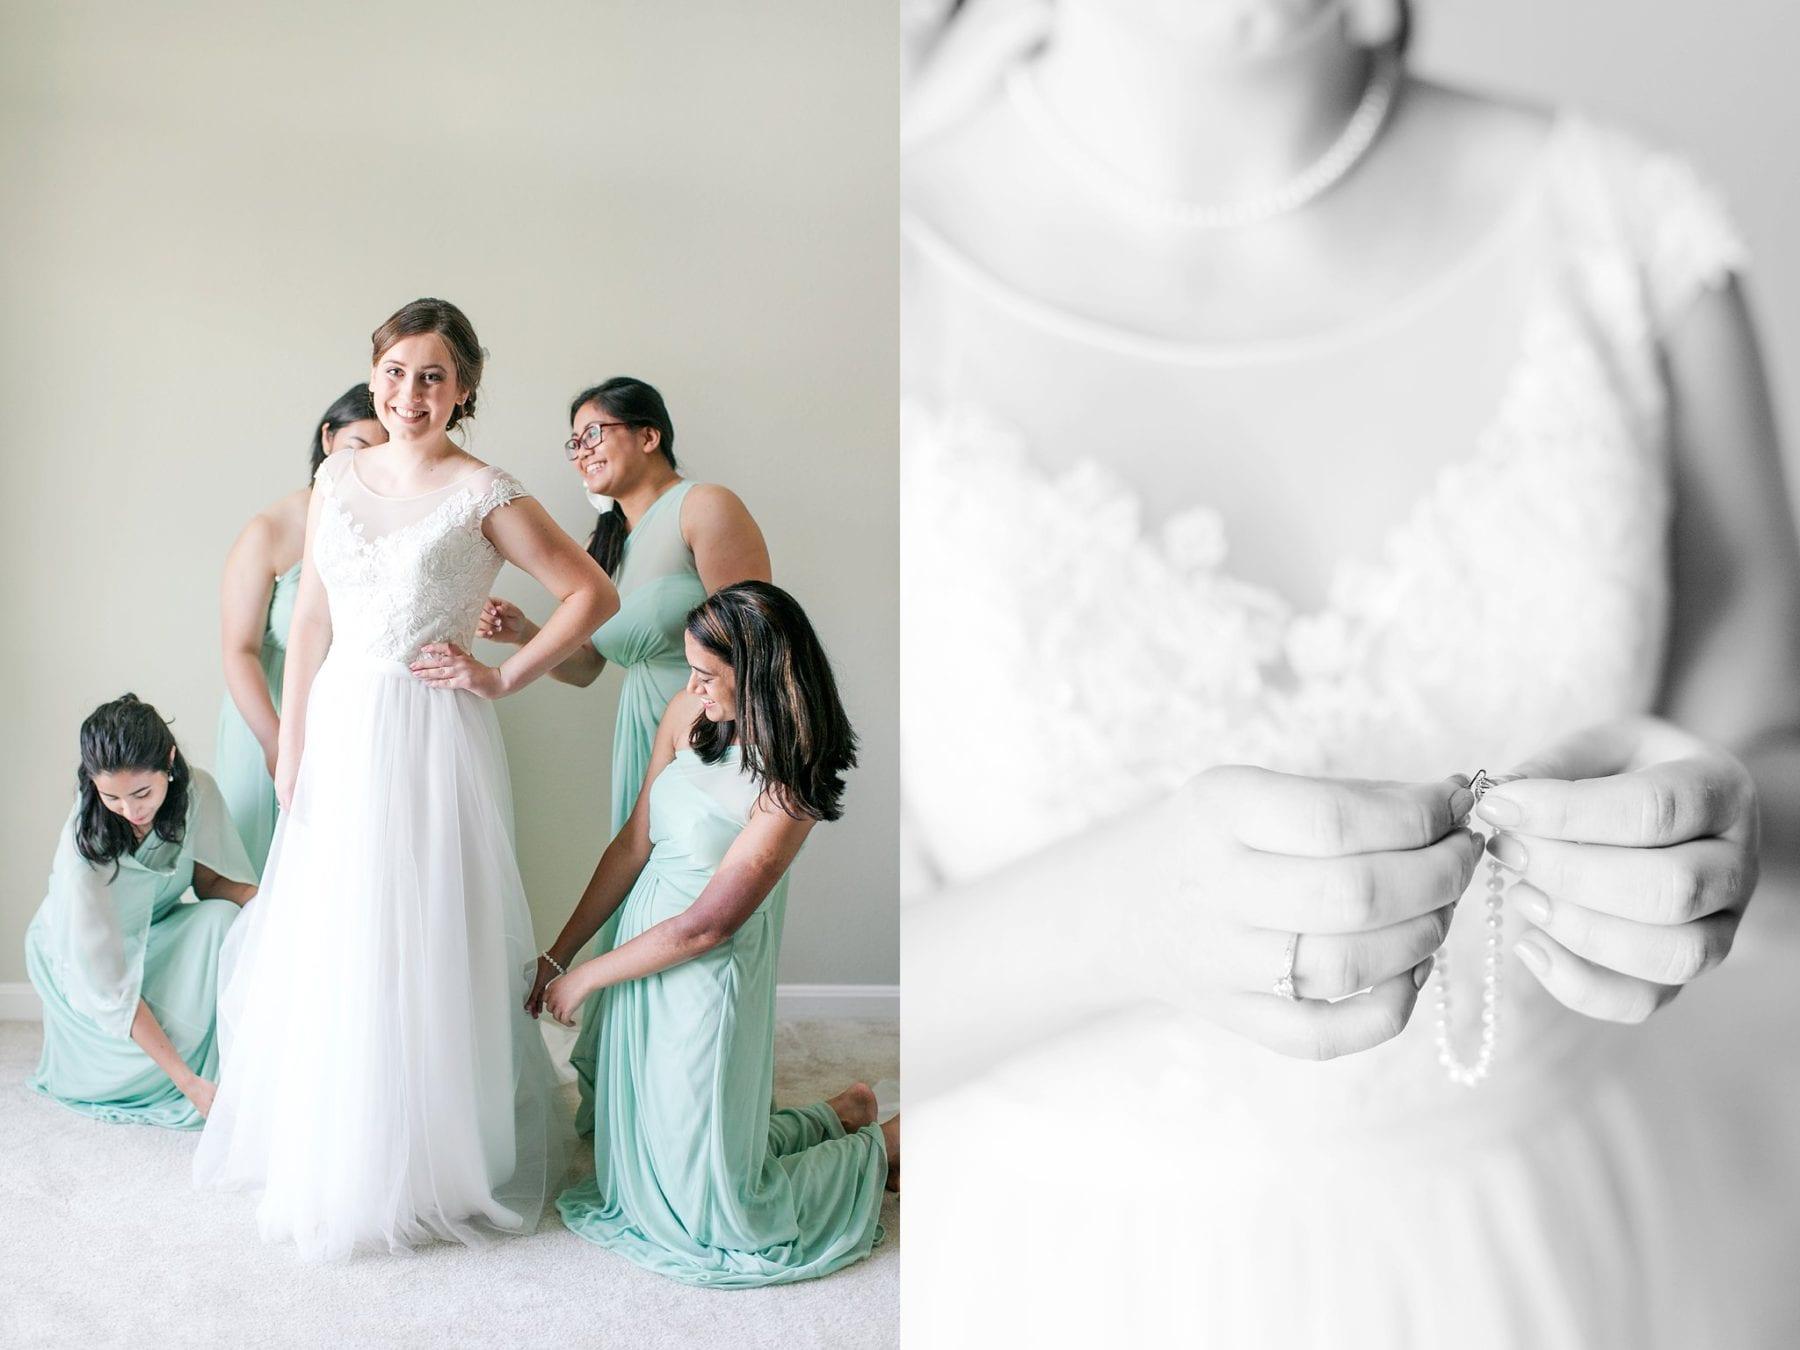 Bristow Manor Wedding Photos Virginia Wedding Photographer Lauren & Andrew Megan Kelsey Photography-79.jpg